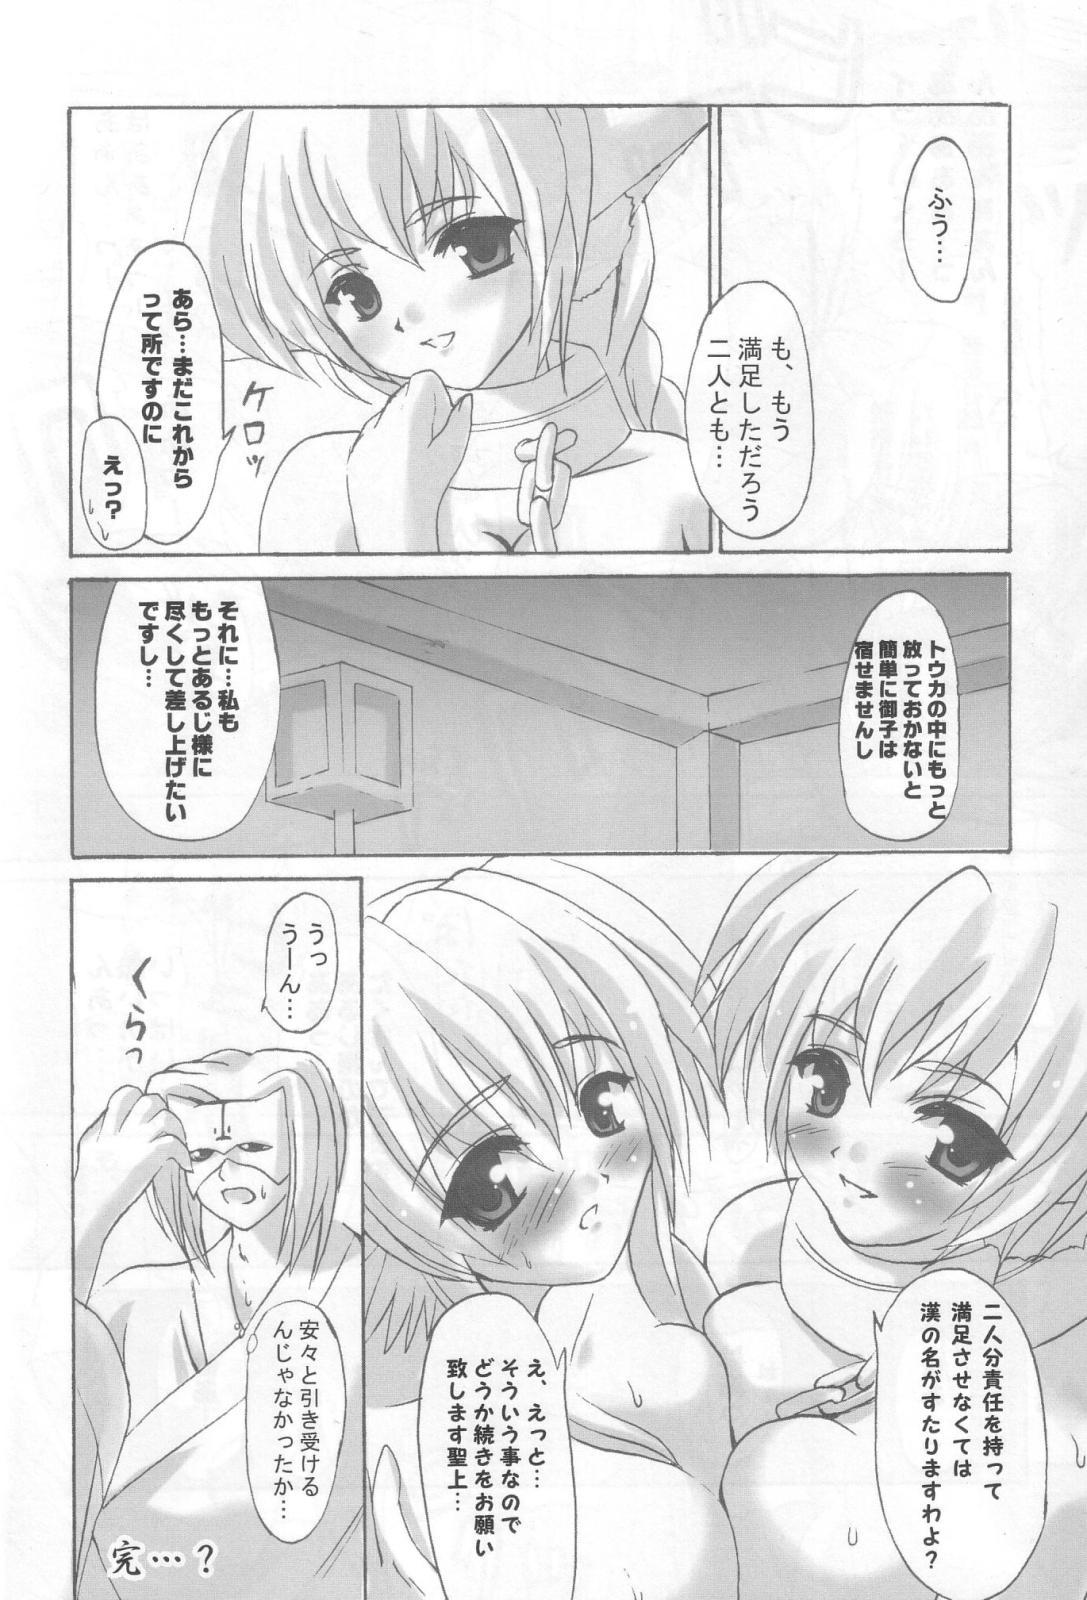 Ikusamiko no Utage 22